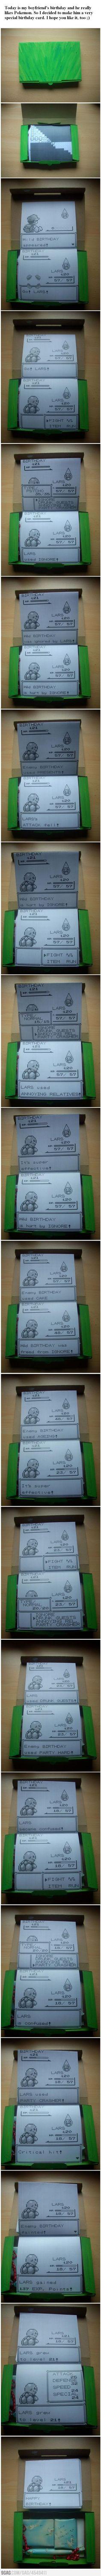 Super effective birthday card